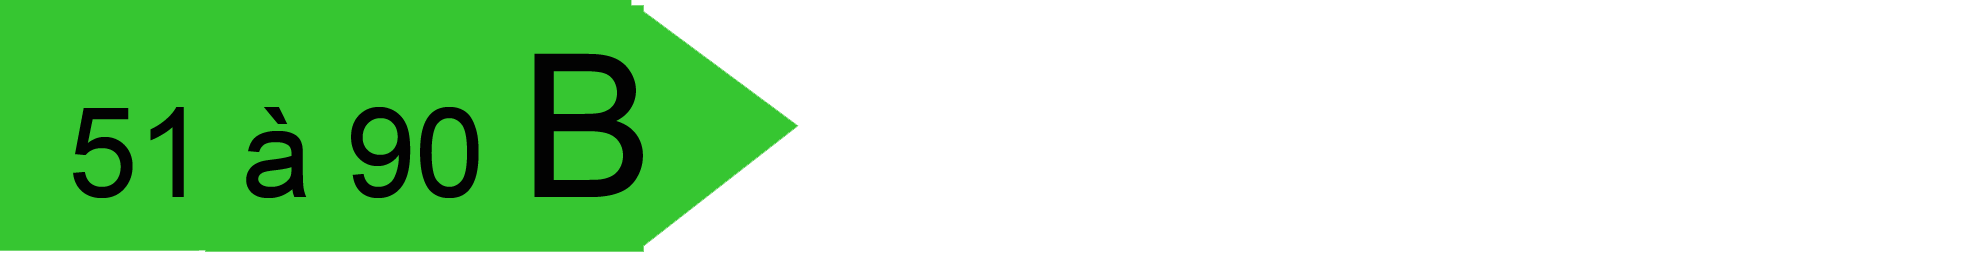 Indice DPE B